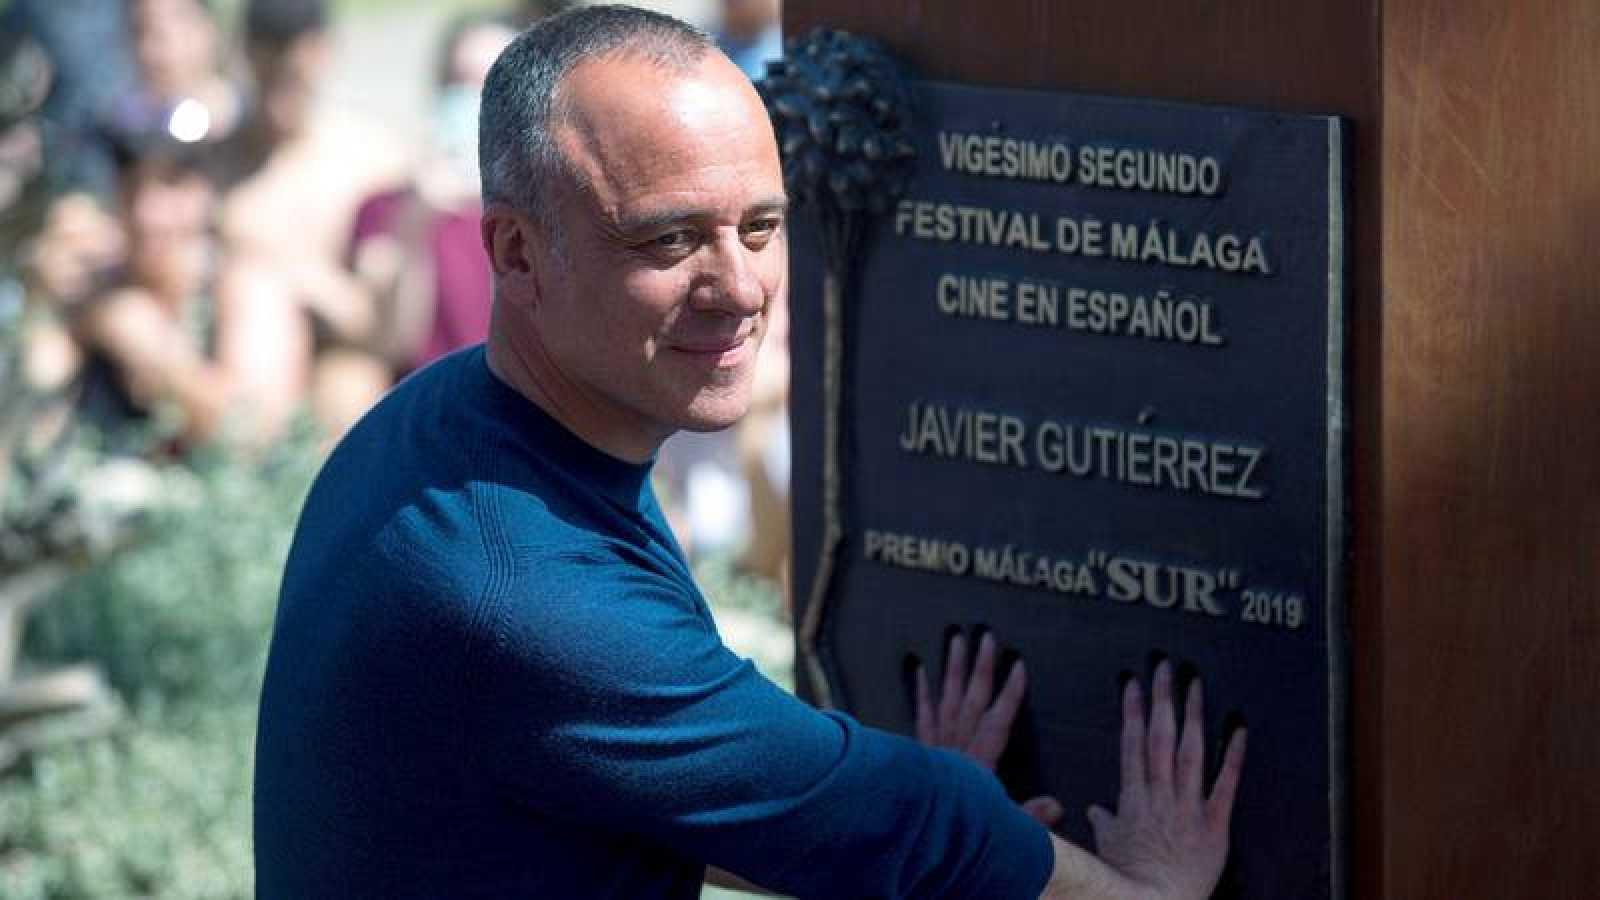 Javier Gutiérrez descubre su monolito